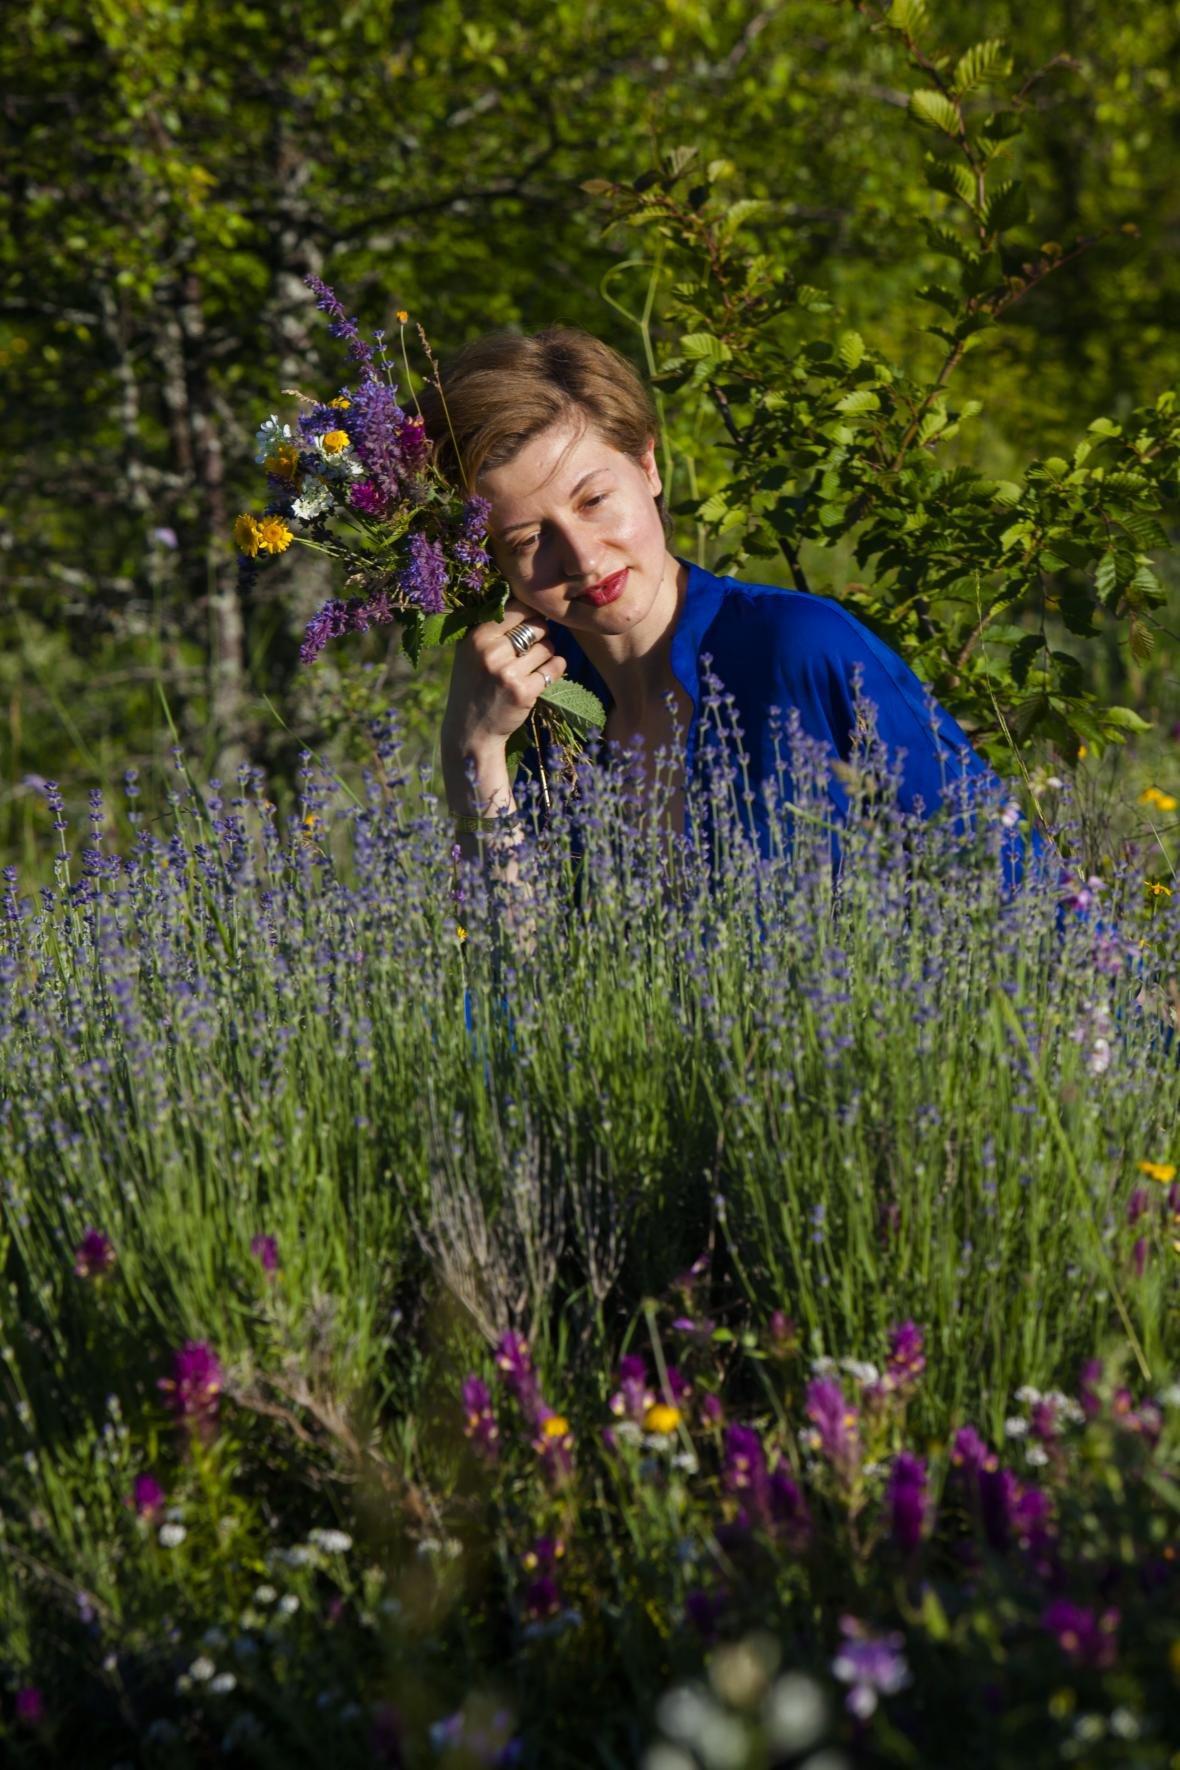 В Ялте презентуют  арт-проект Виктории Меренковой «Ботаника. Внутри меня», фото-2